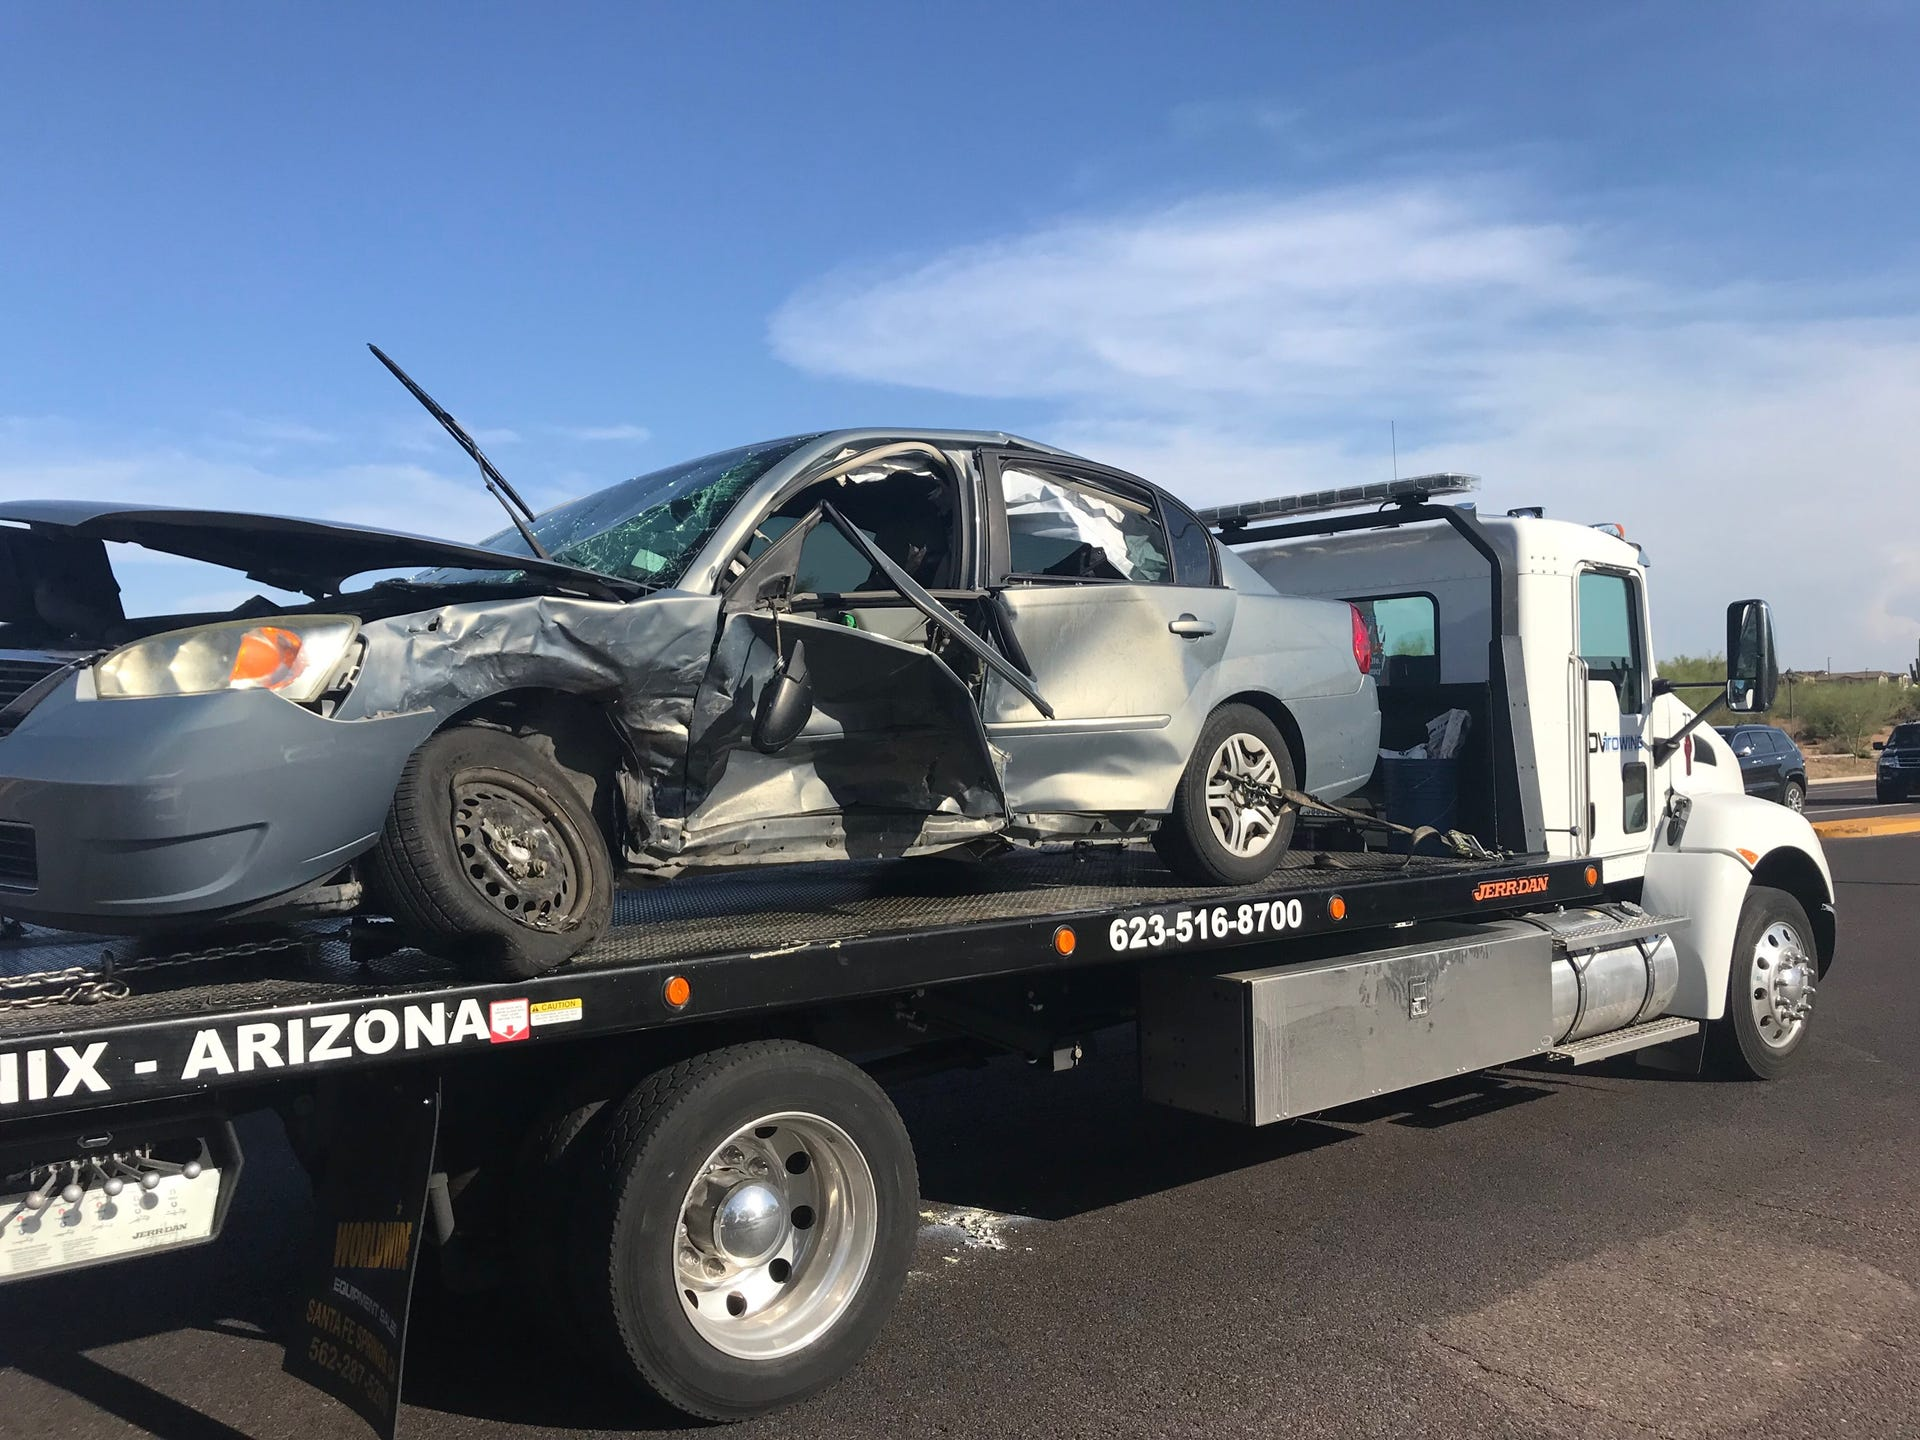 Phoenix police officer injured in car crash